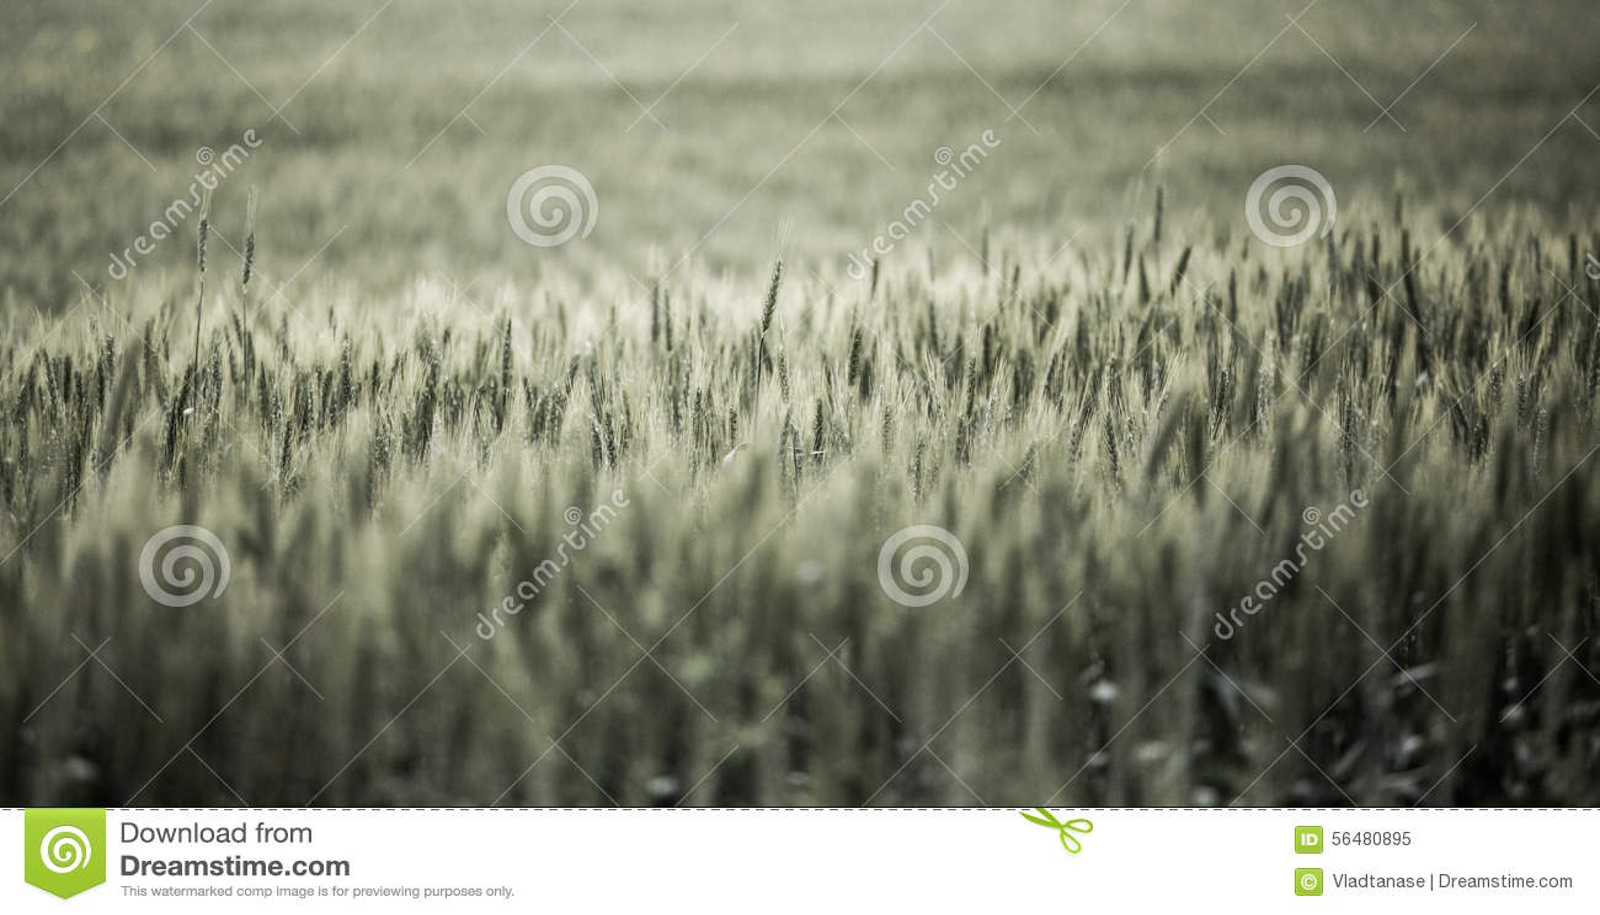 Horizontal avec du blé